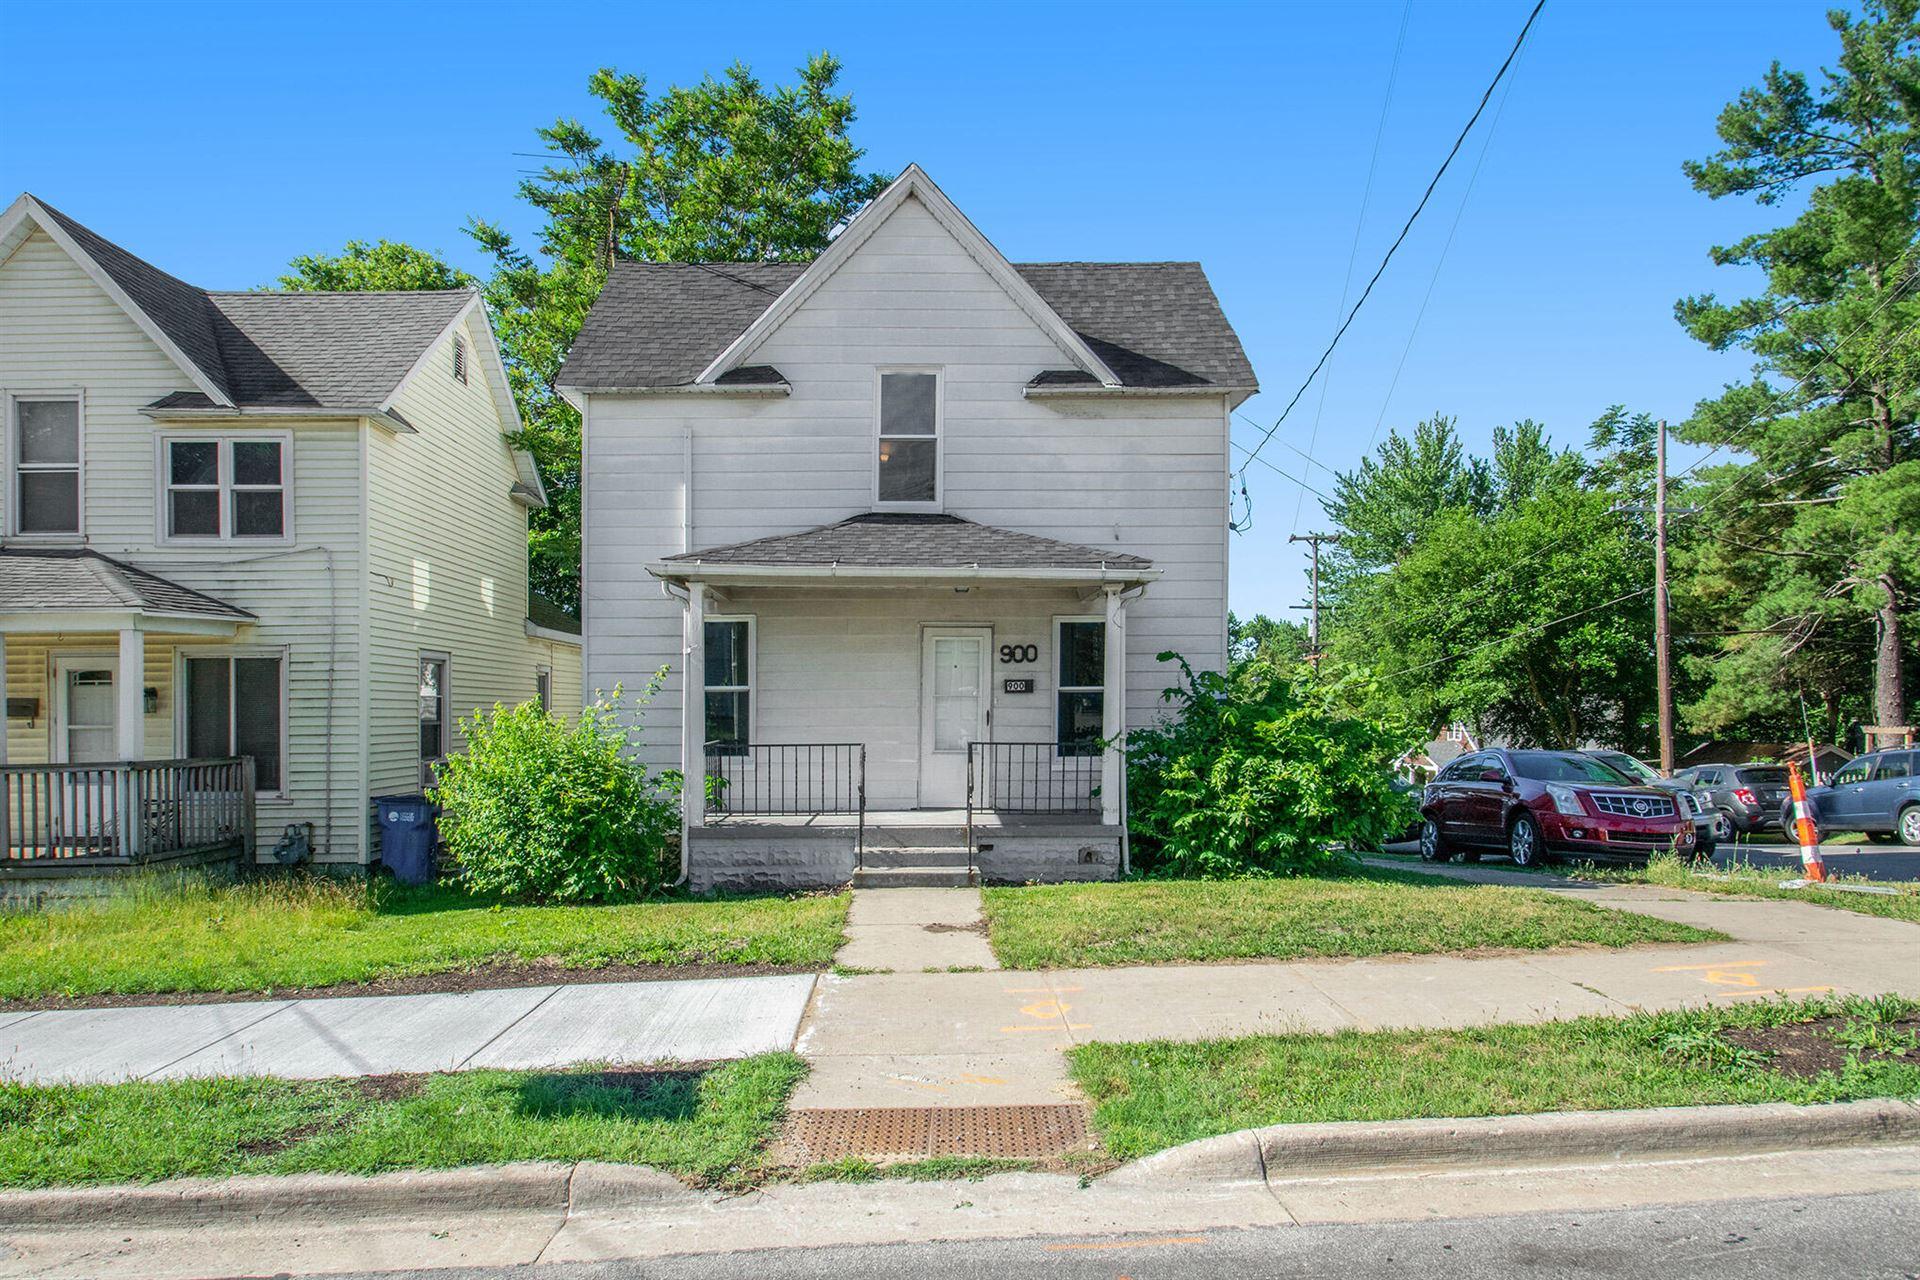 900 Hall Street SE, Grand Rapids, MI 49507 - MLS#: 21094914